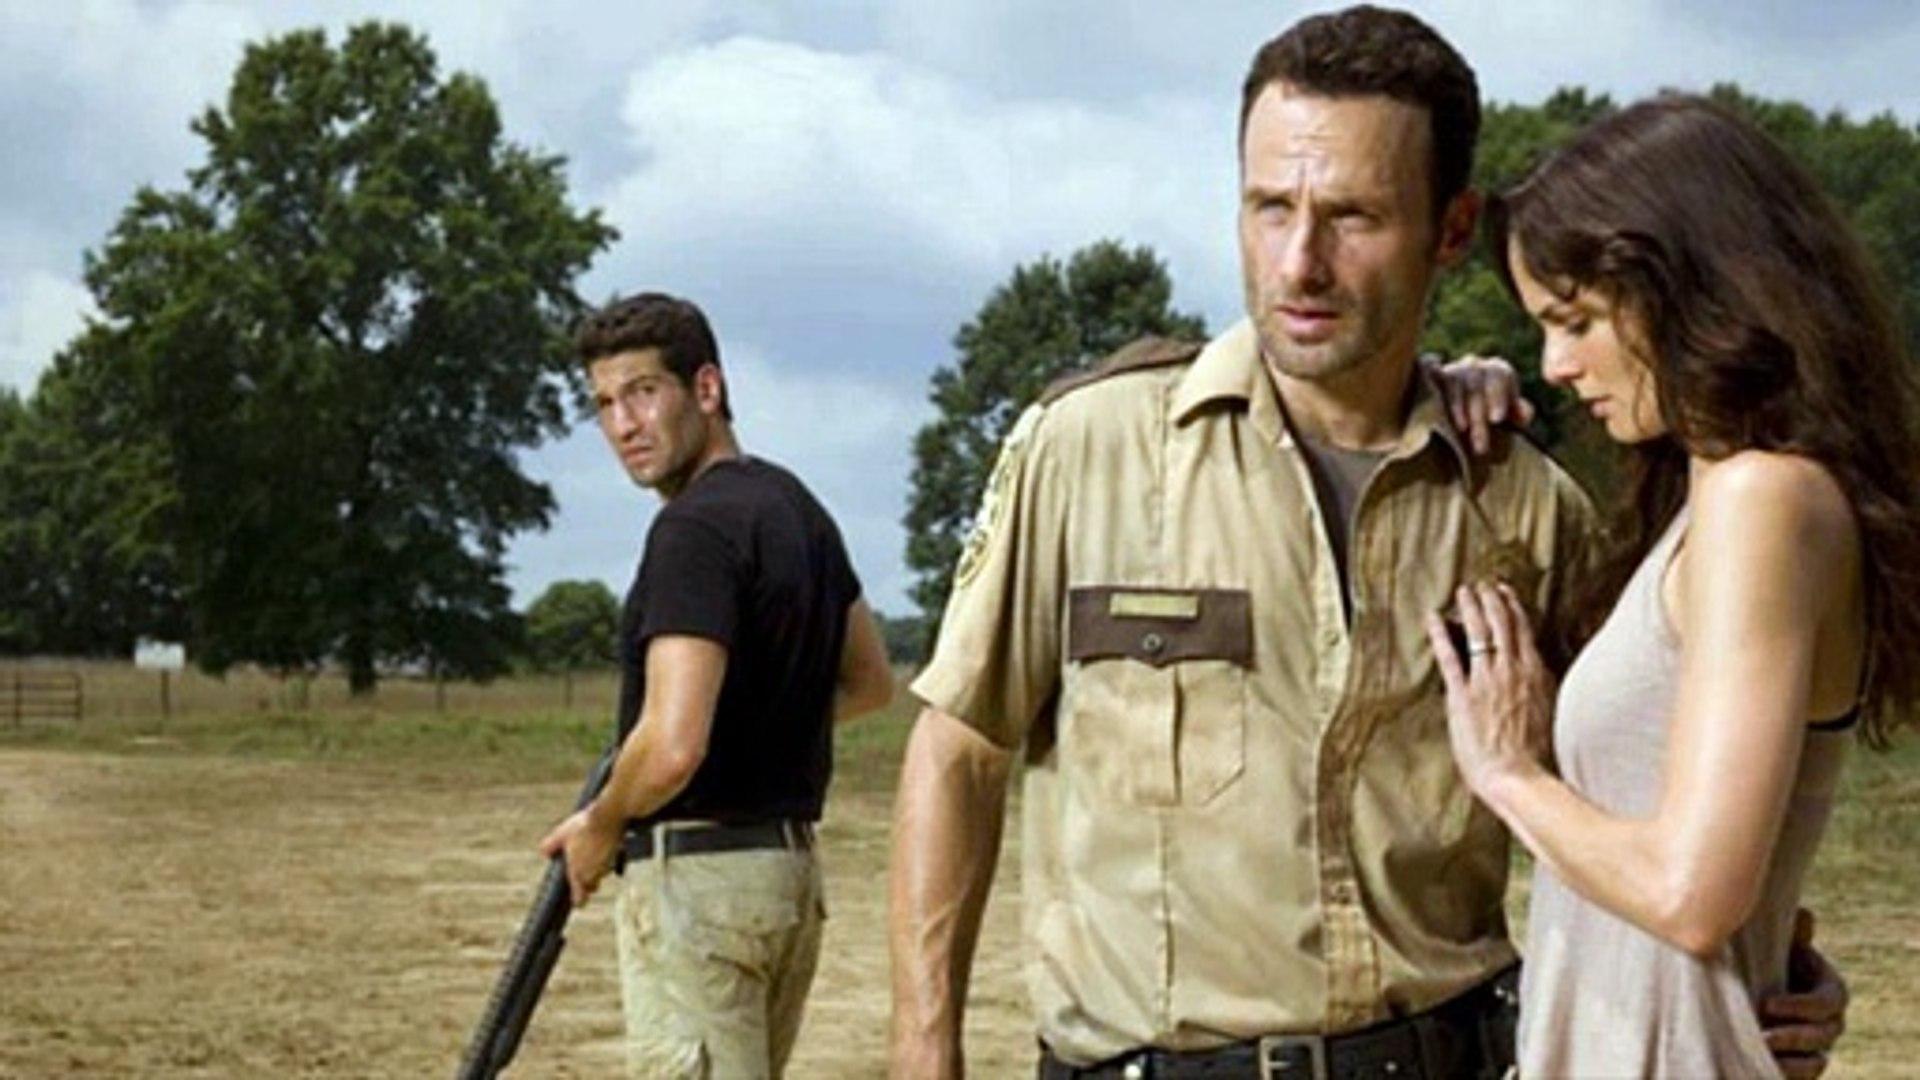 The Walking Dead Season 6 Full Episode Online For Free In Hd Video Dailymotion